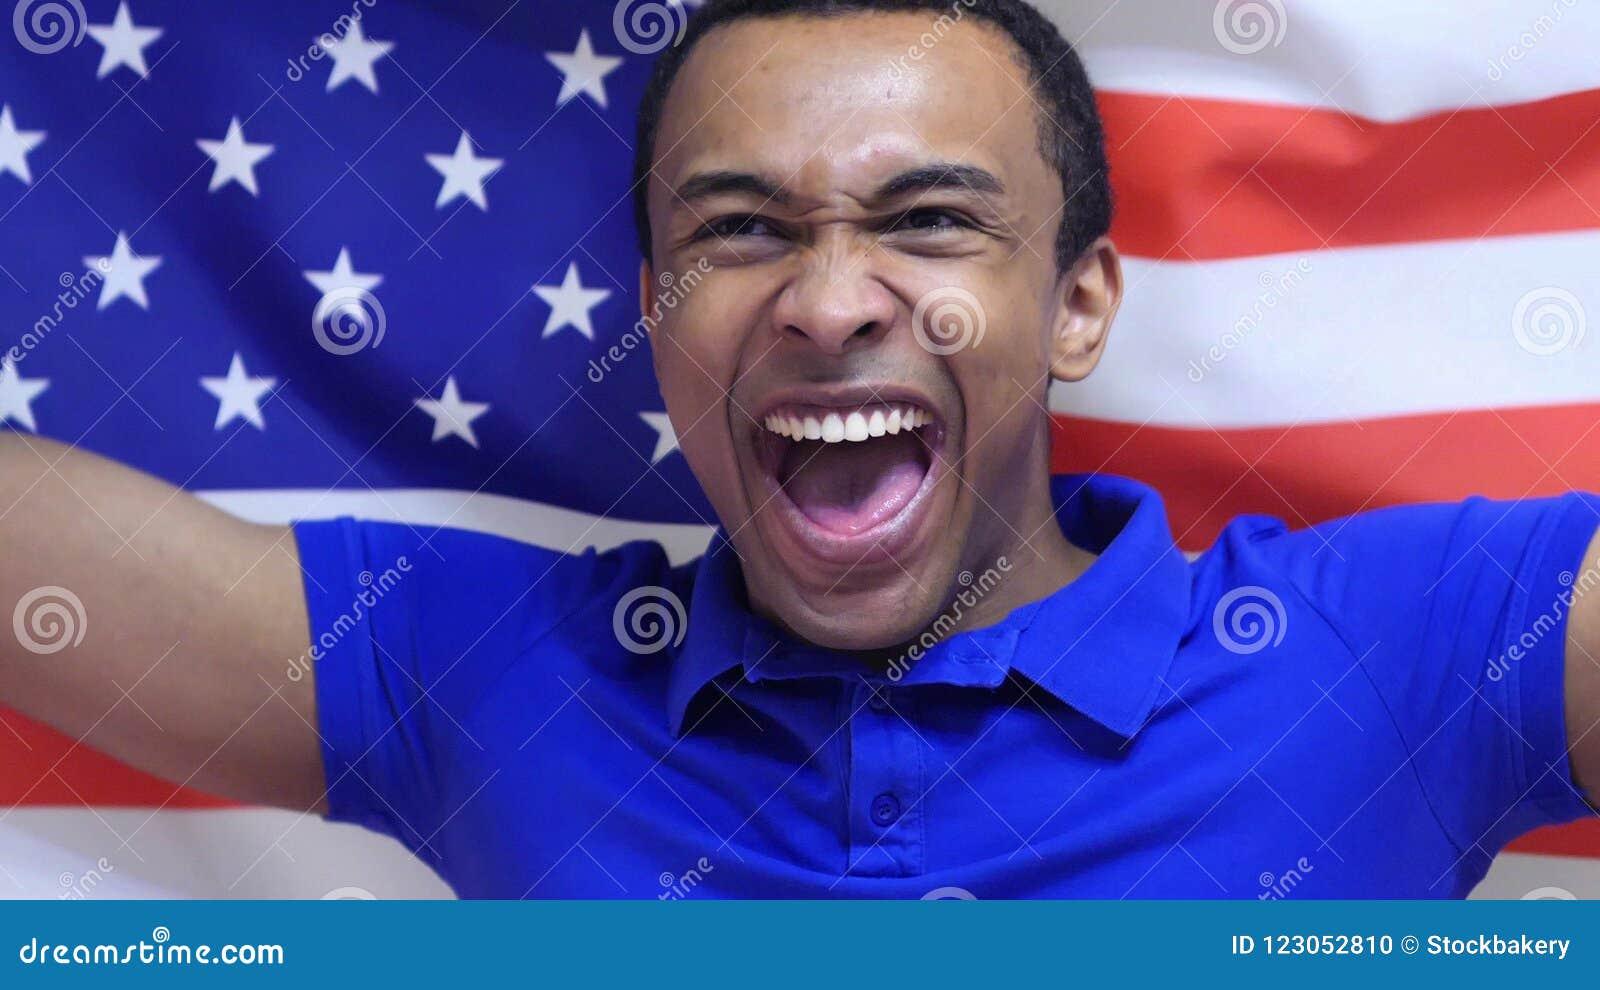 Fan americana Celebrates que celebra la bandera de los E.E.U.U. en la cámara lenta